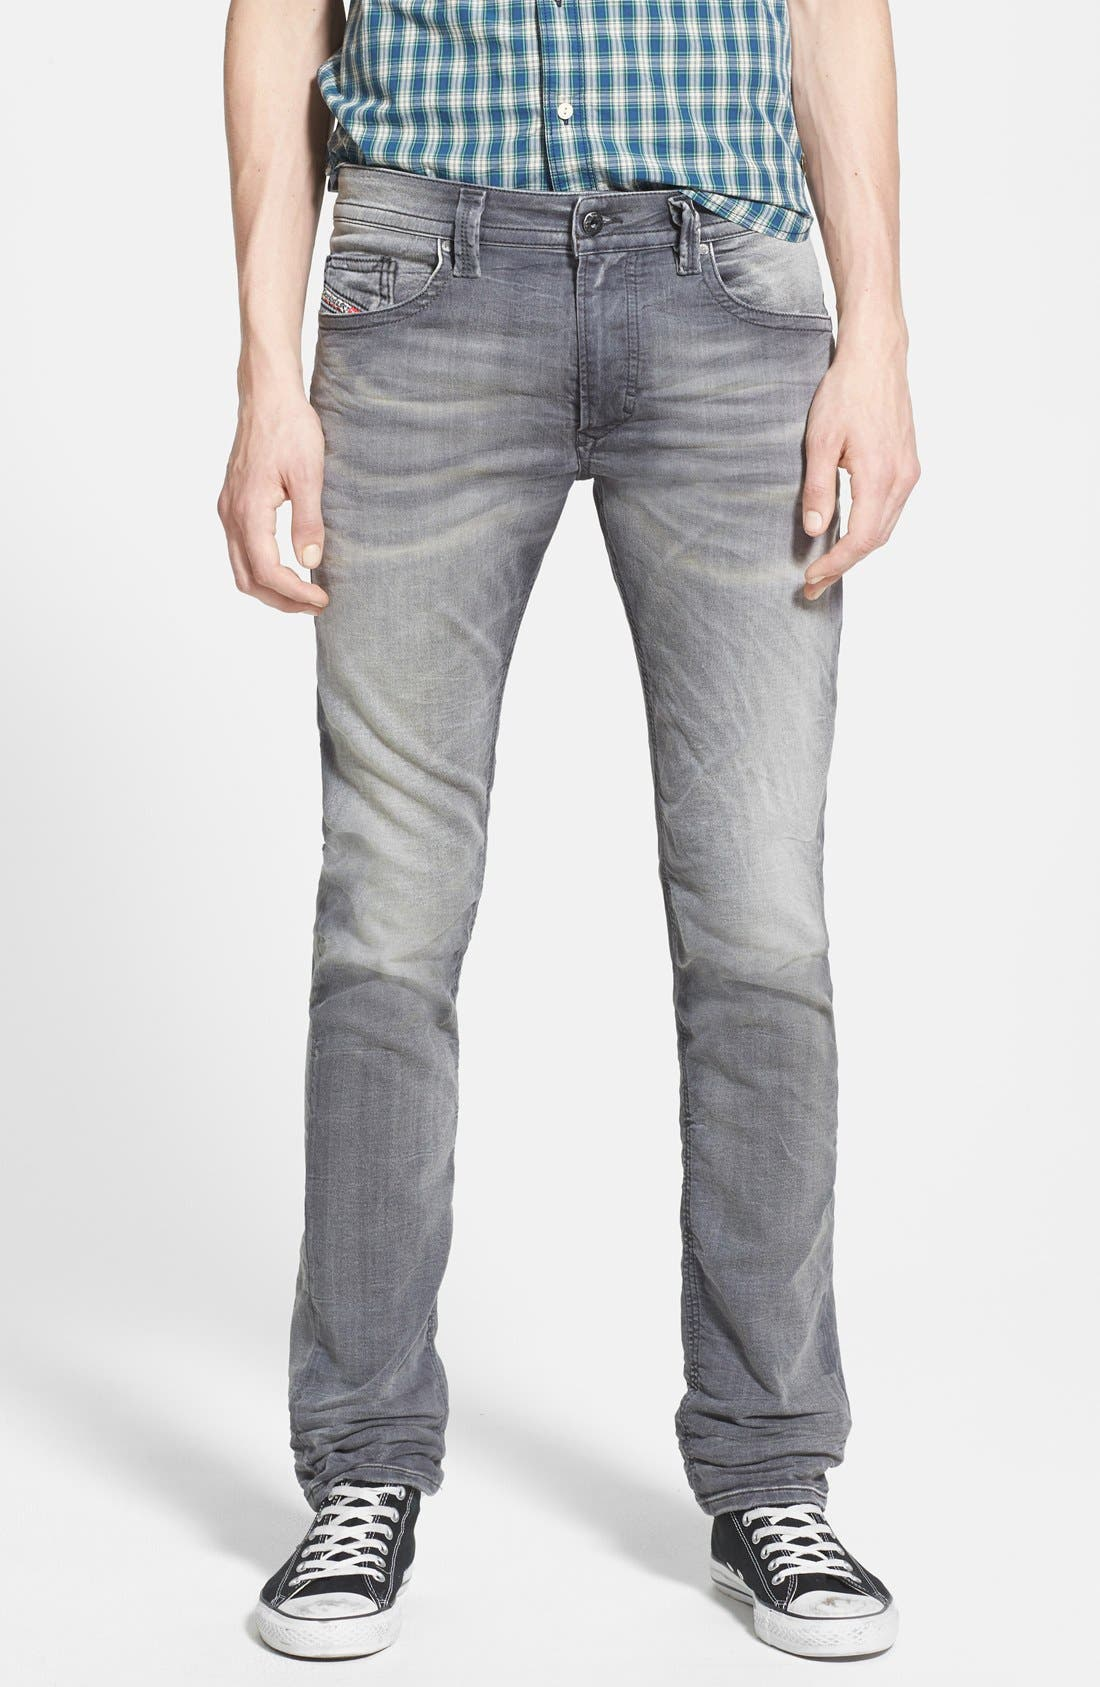 Alternate Image 1 Selected - DIESEL® 'Thavar Jogg' Skinny Fit Jeans (0830Q)